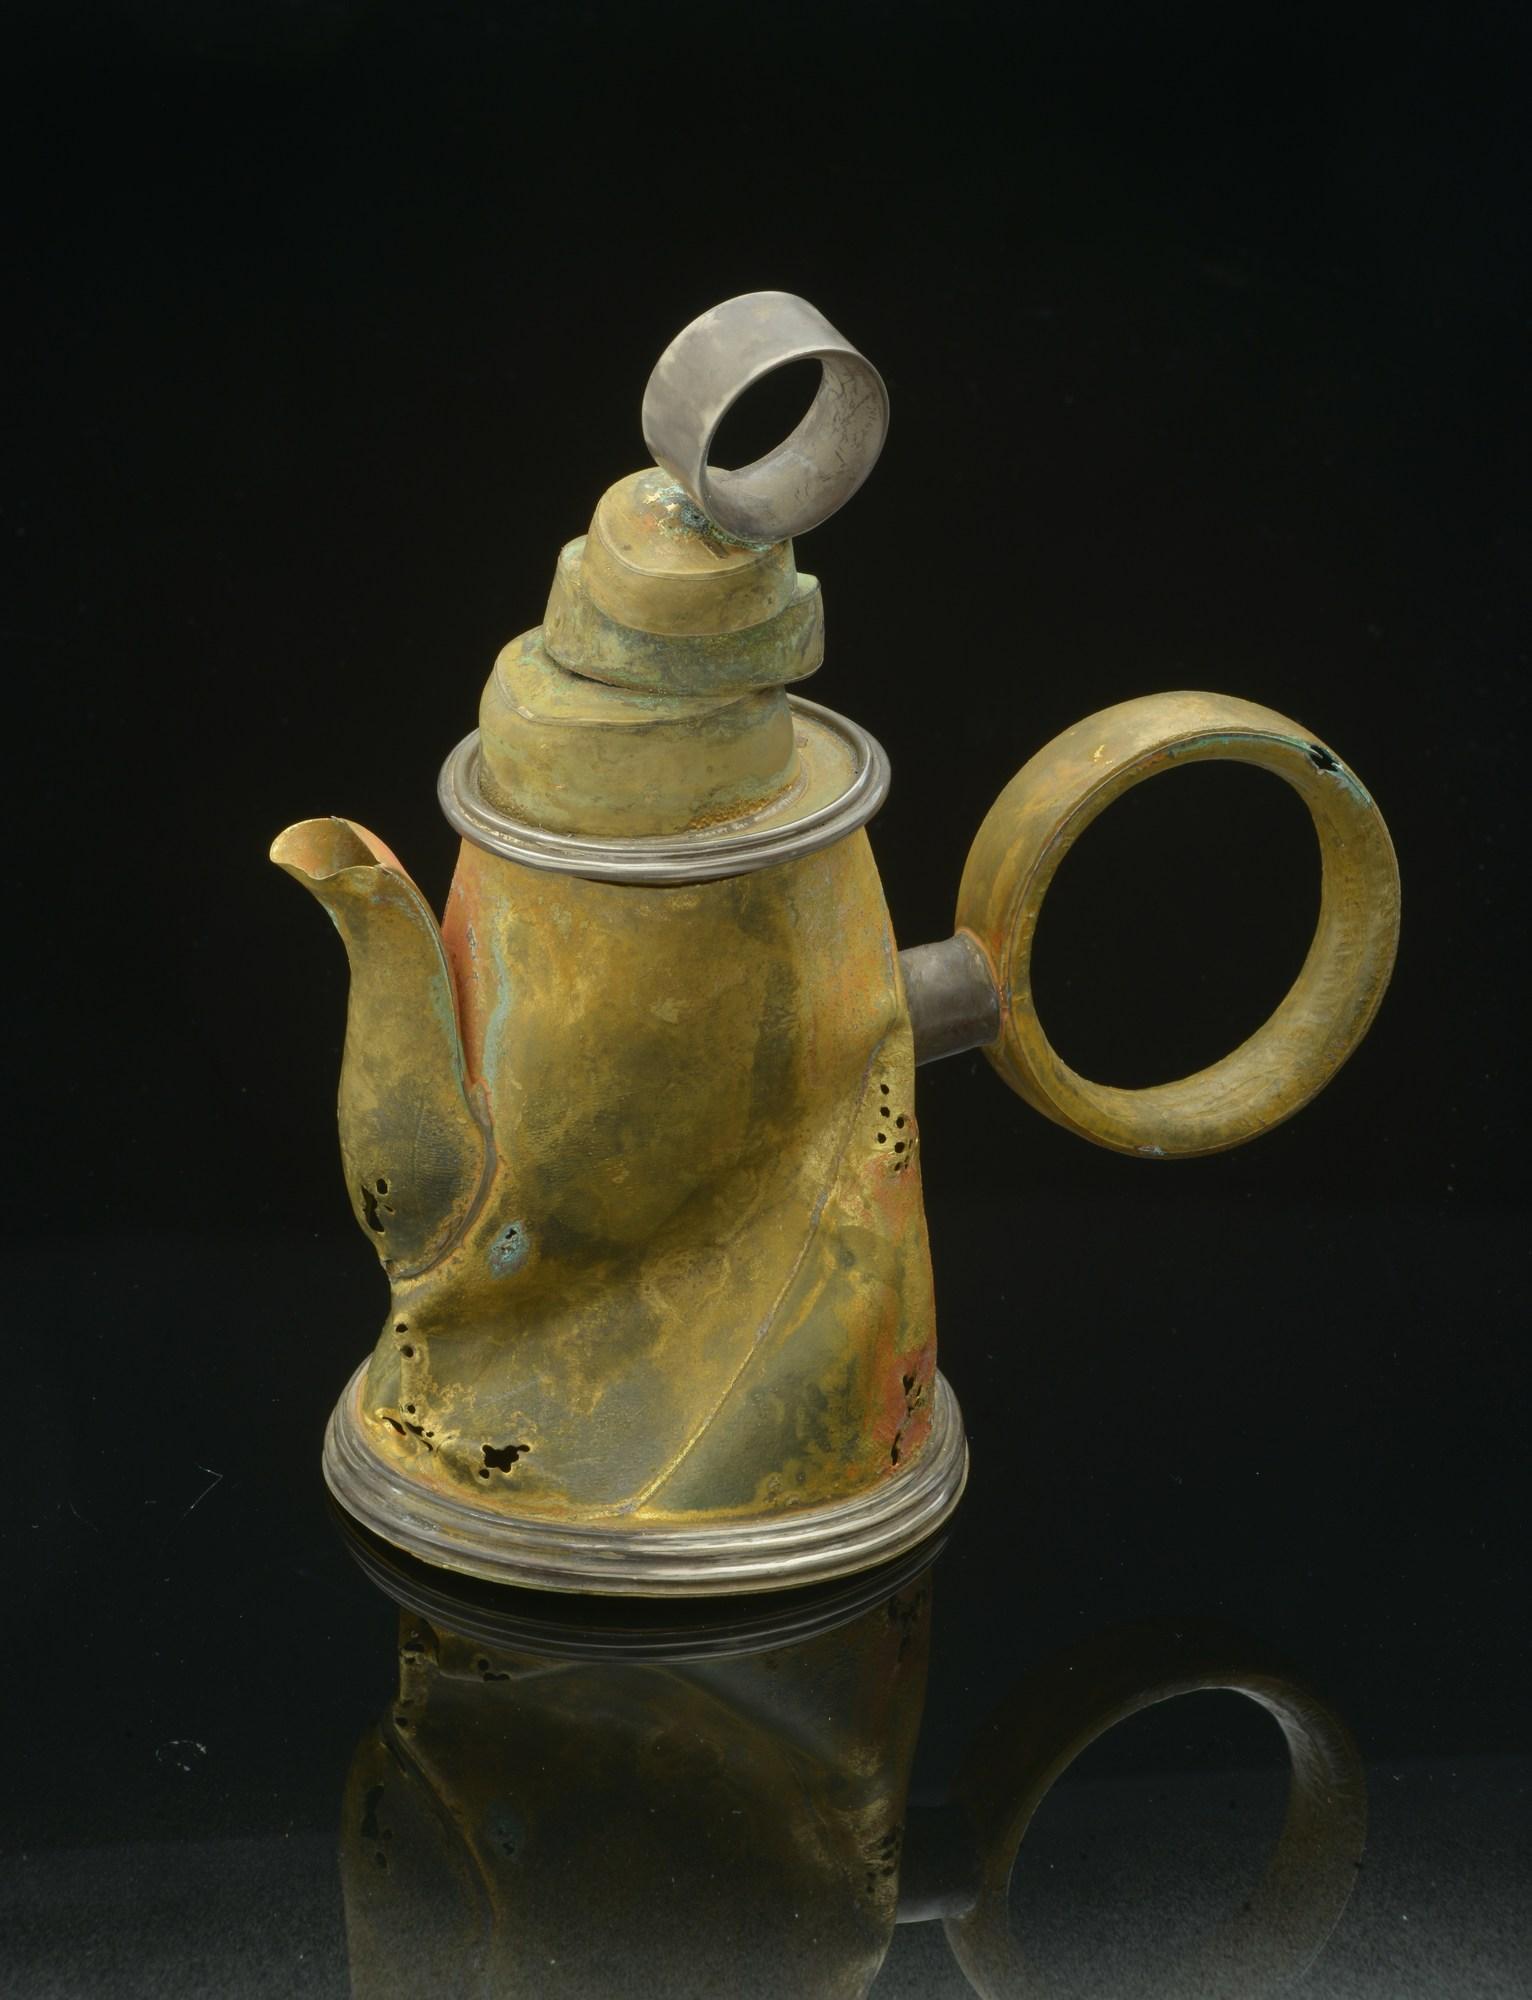 Life's Struggles Teapot